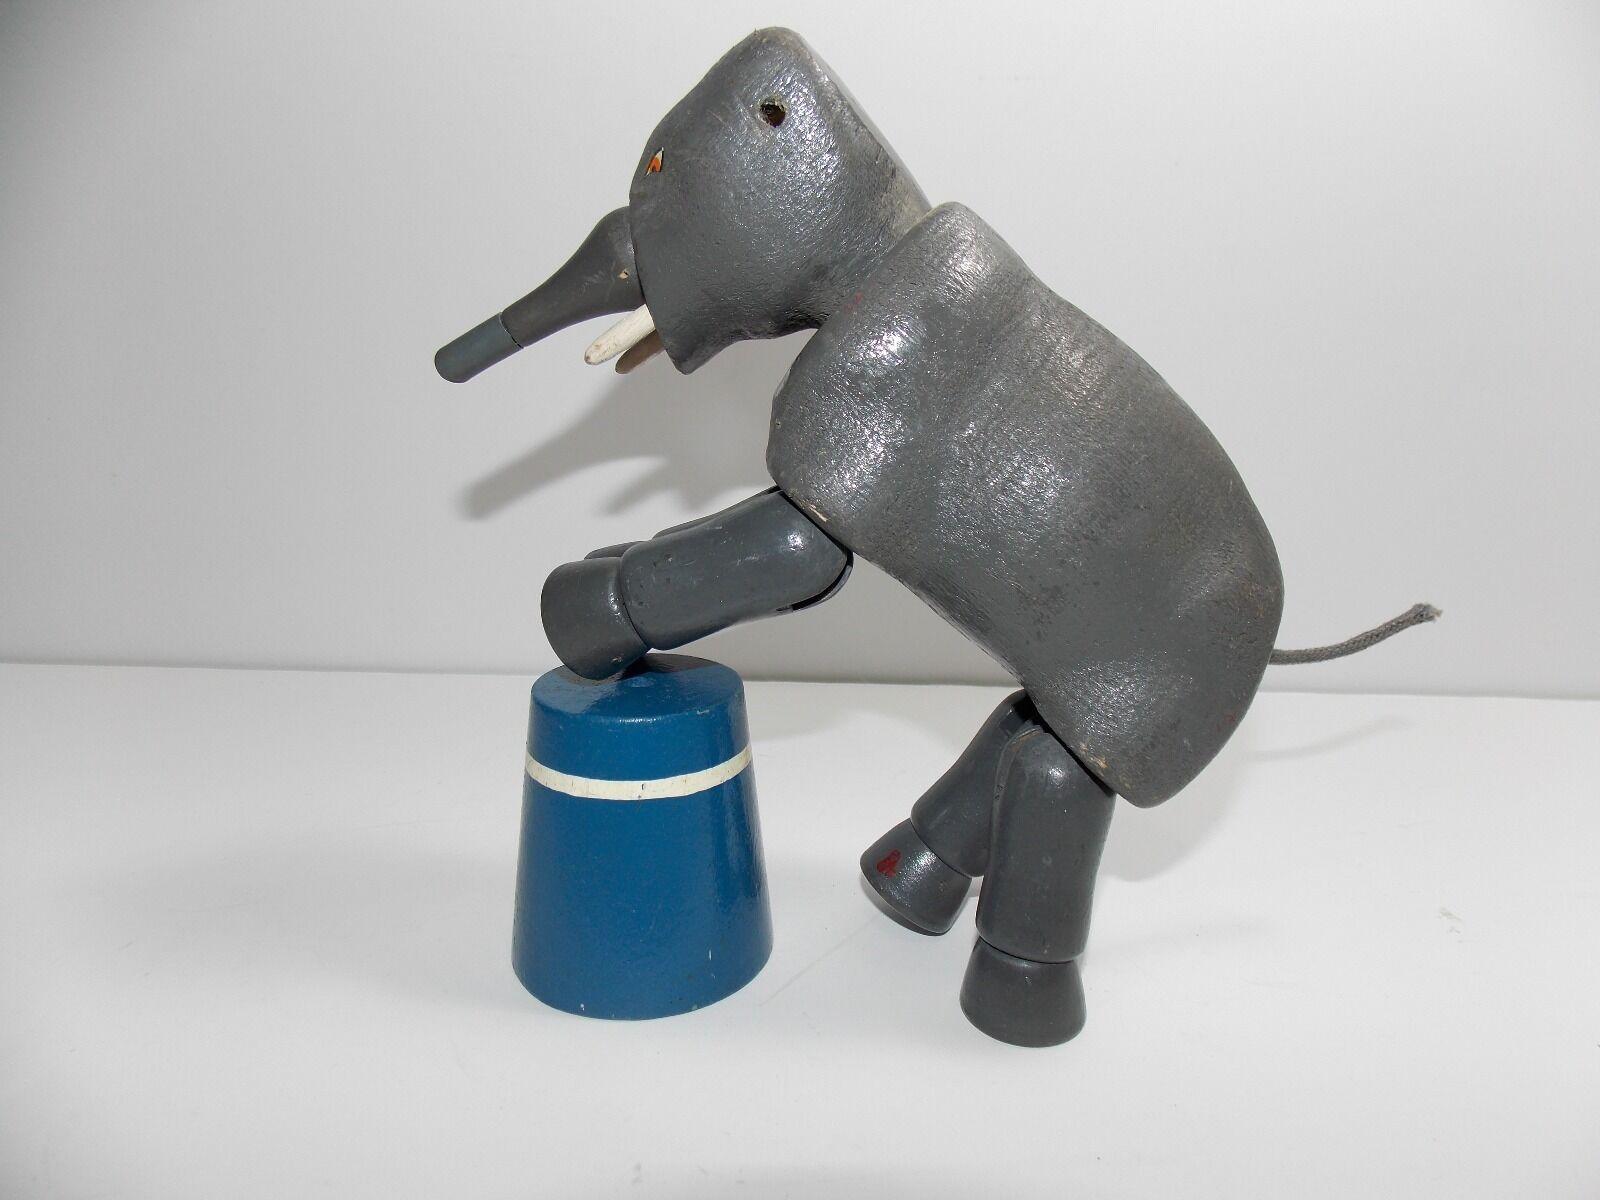 ANTIQUE 1950's DELAVAN CO CIRCUS ELEPHANT HUMPTY DUMPTY DELAVAN WI WOOD JOINTED